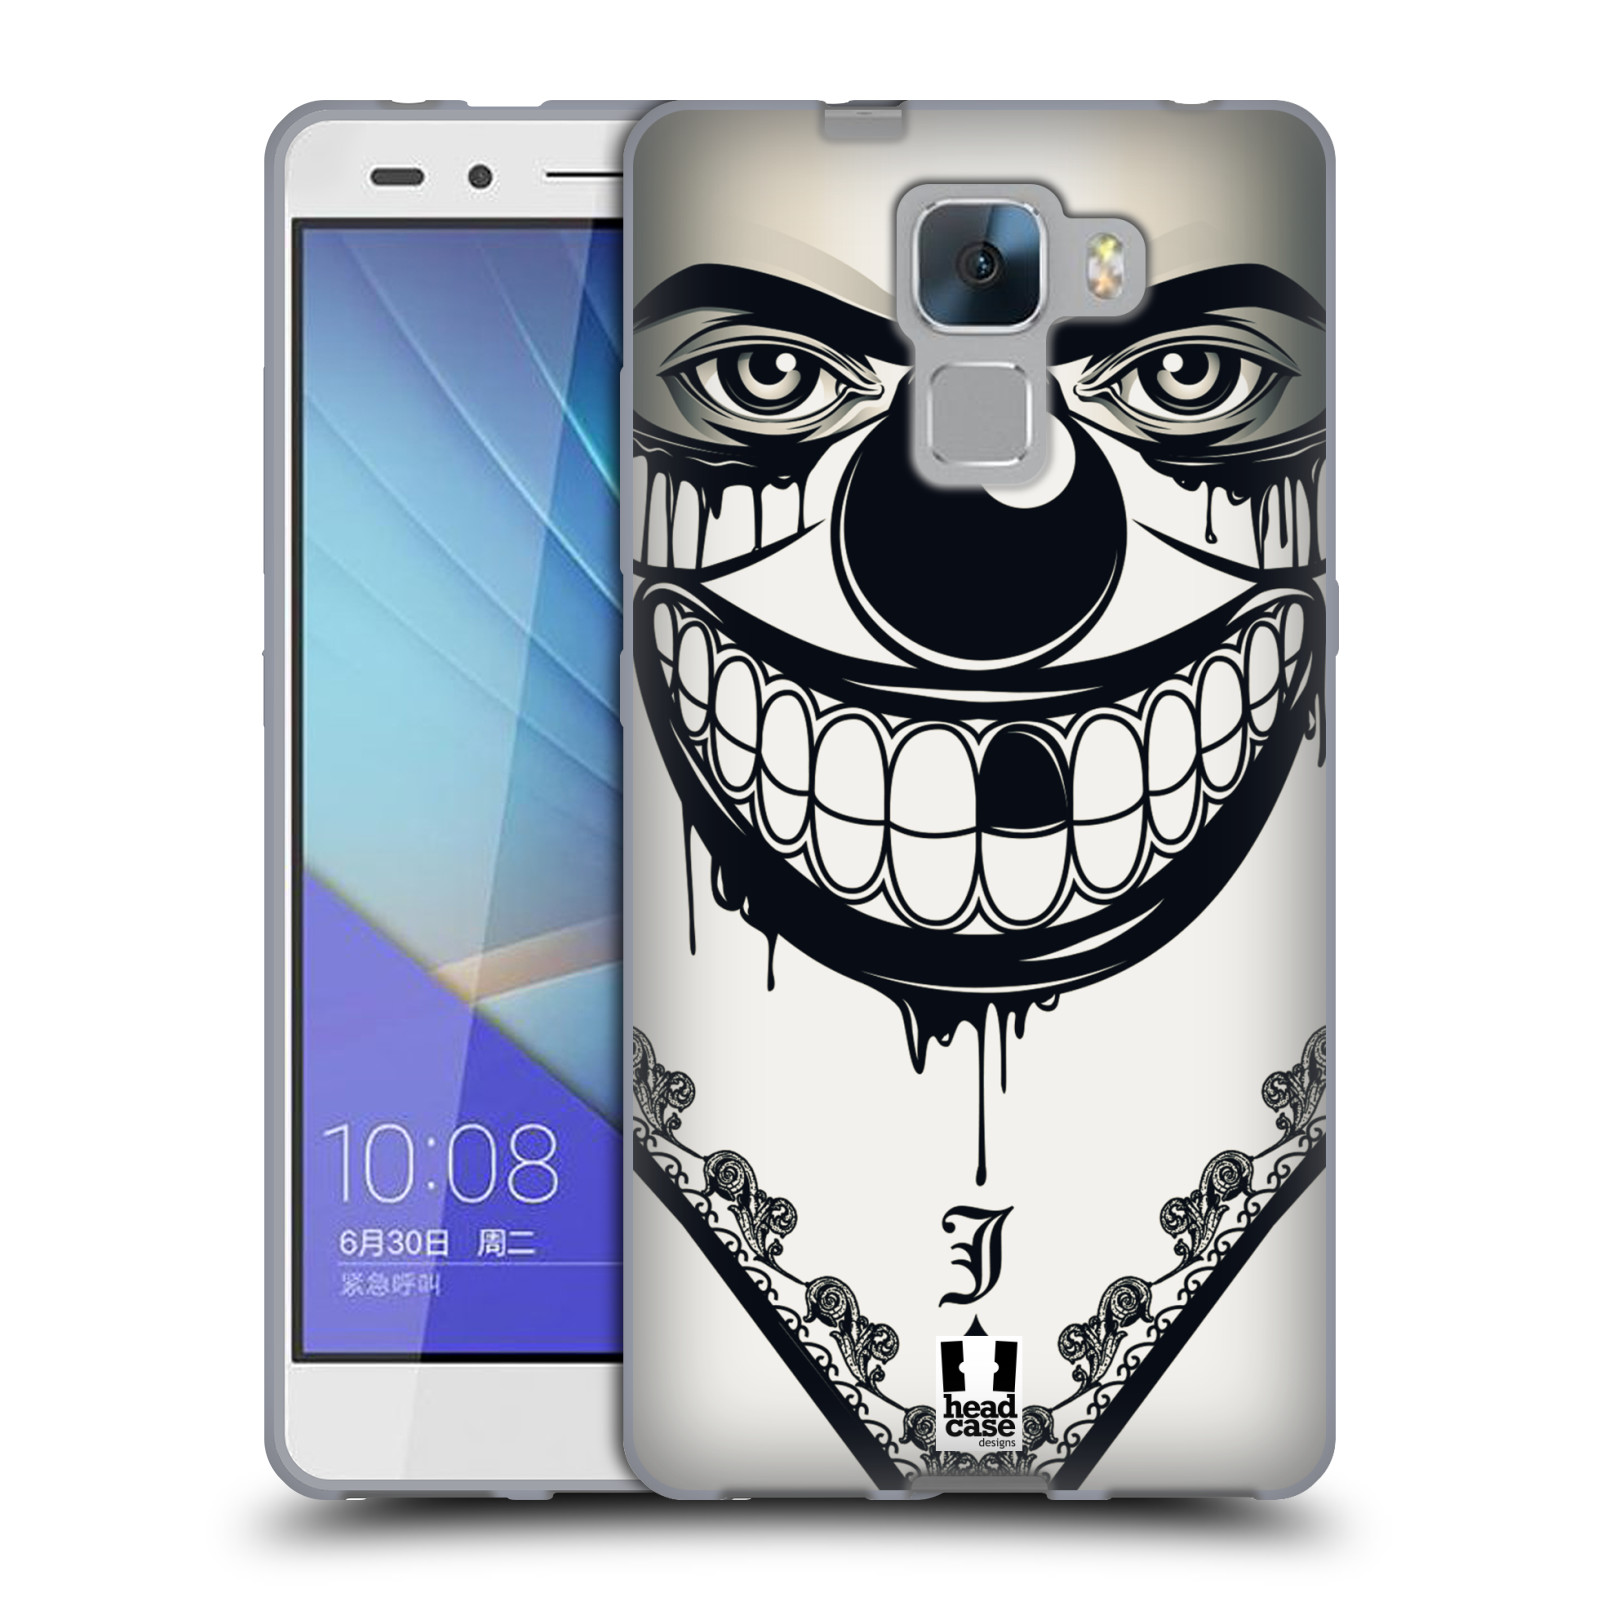 Silikonové pouzdro na mobil Honor 7 HEAD CASE ZLEJ KLAUN